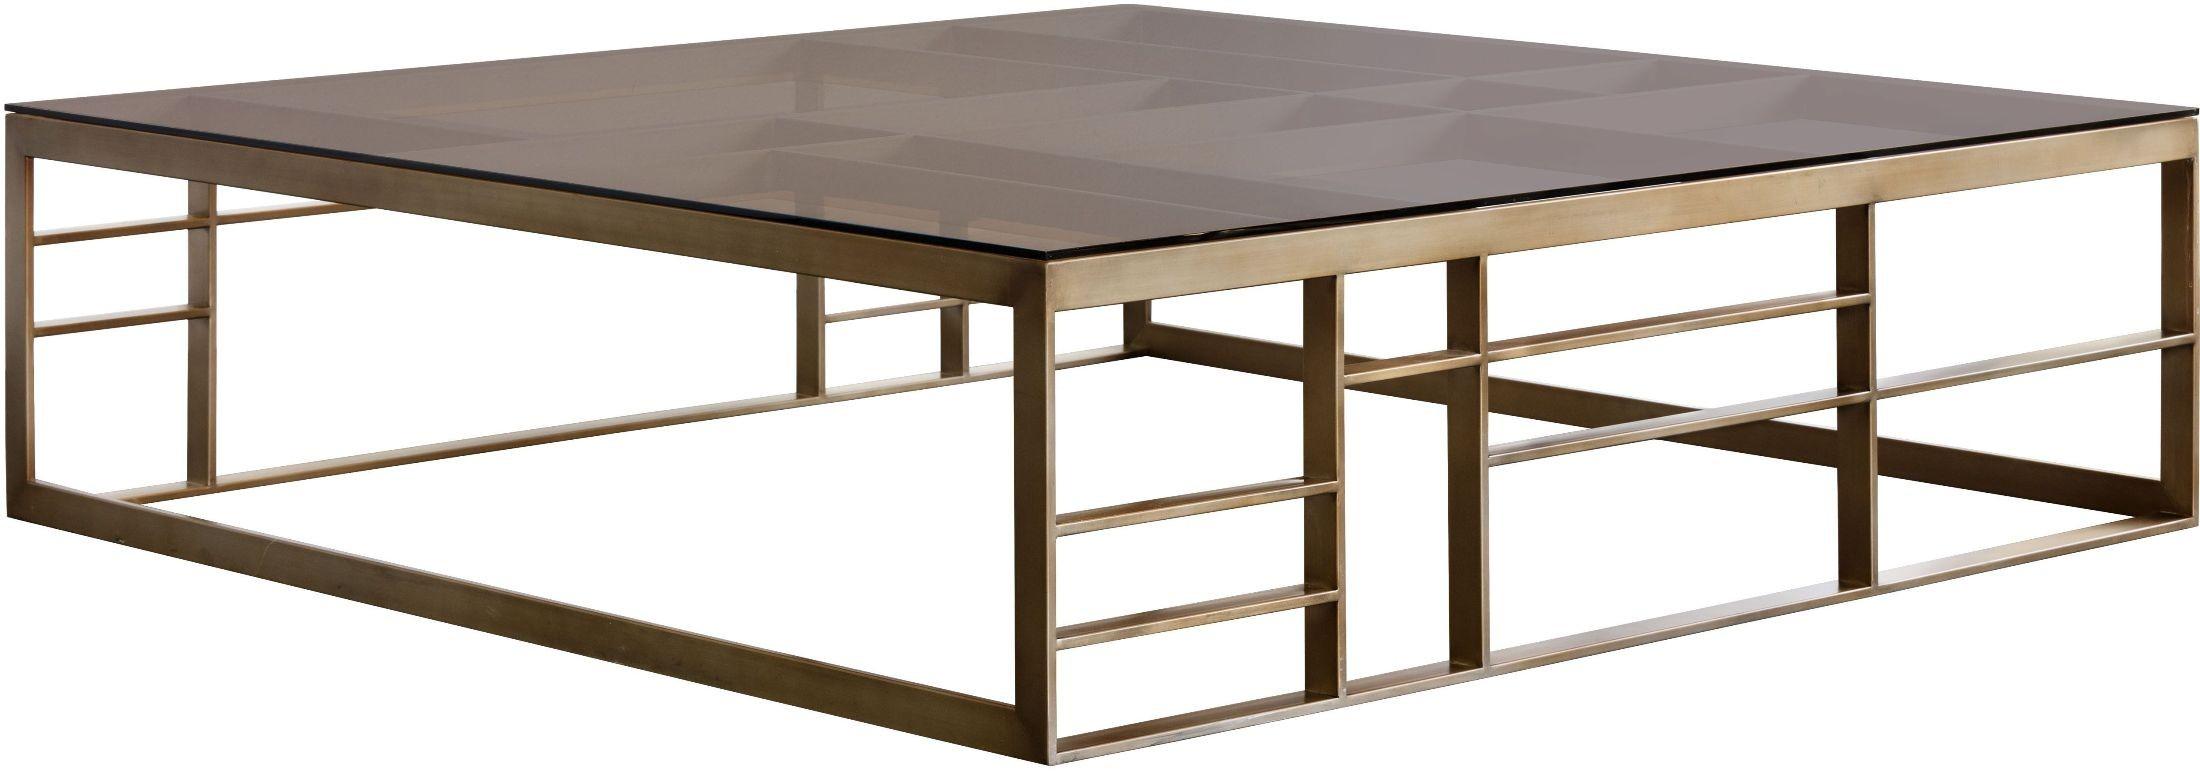 Joanna Brown Glass Square Coffee Table 102073 Sunpan Modern Home